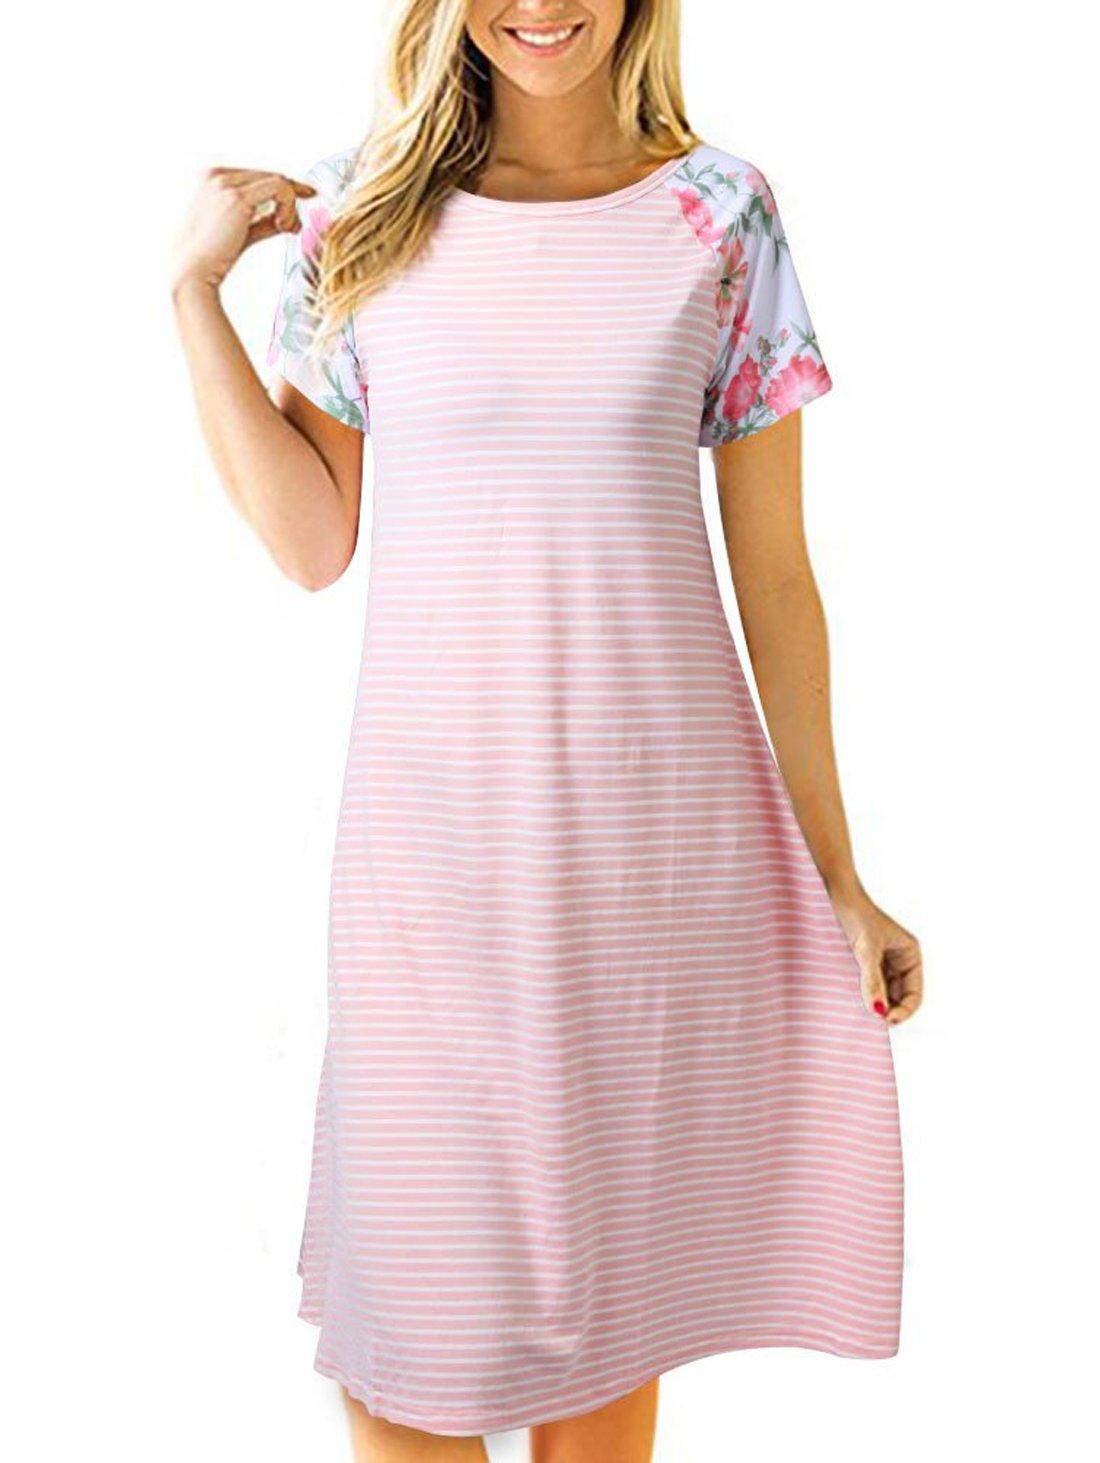 Uideazone Women Floral Striped Tunic Dress Summer Casual Crew Neck T Shirt Dress Pink